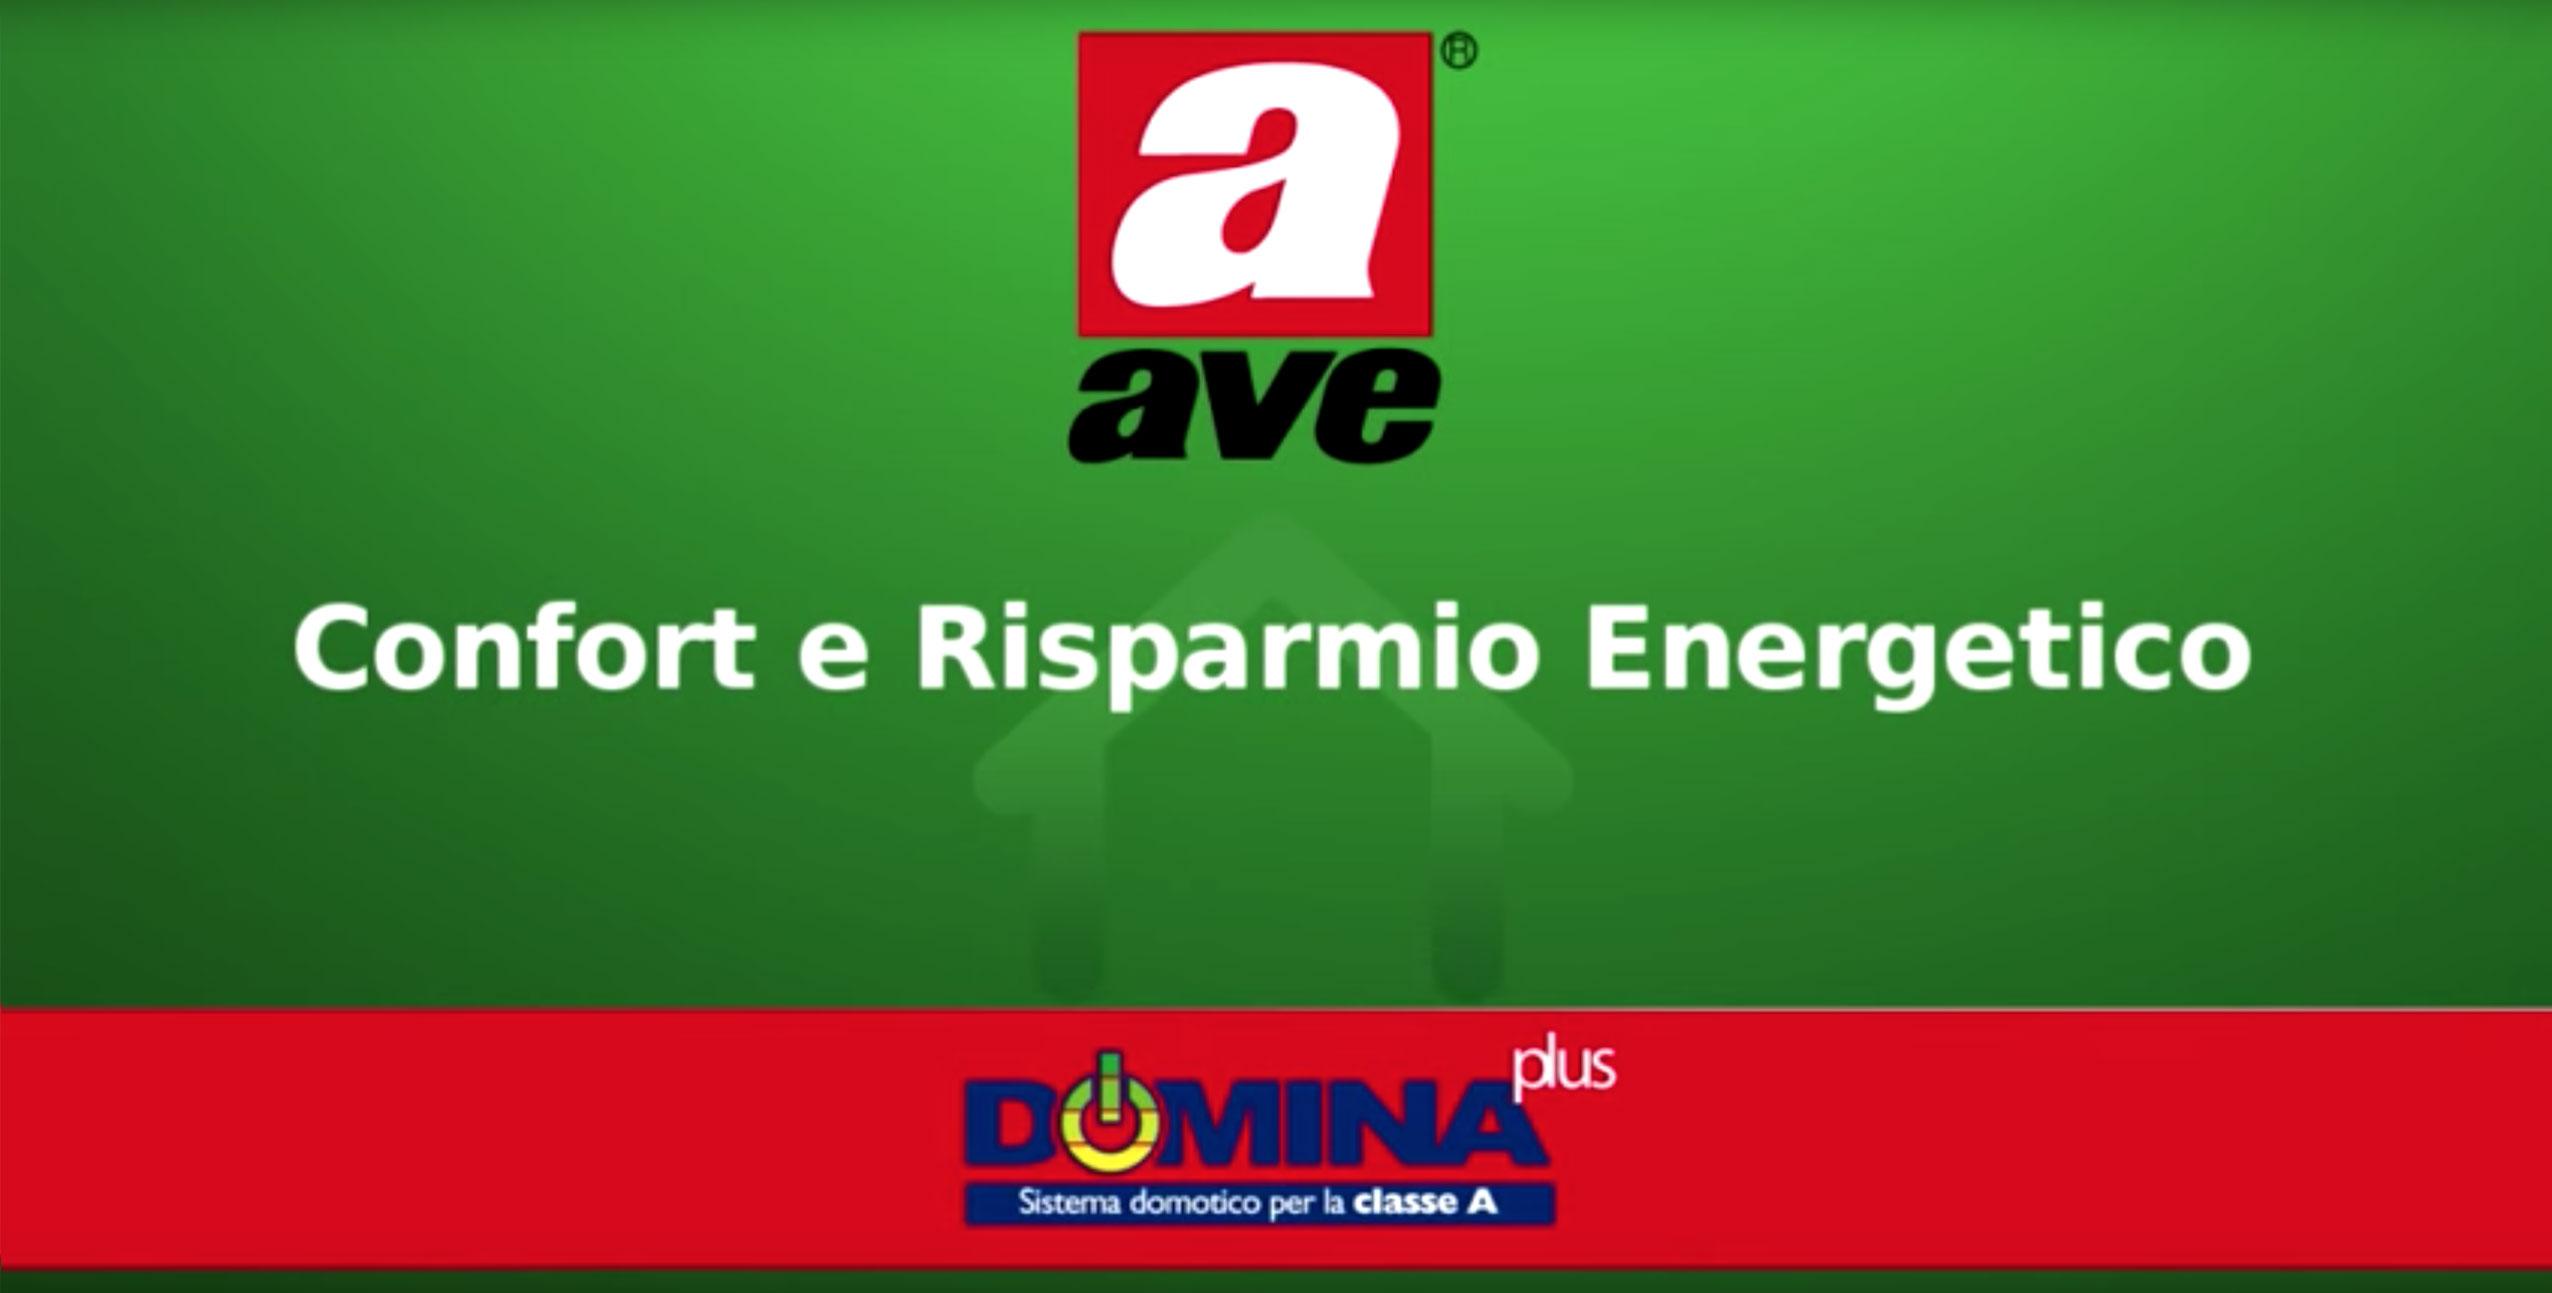 Confort e risparmio energetico